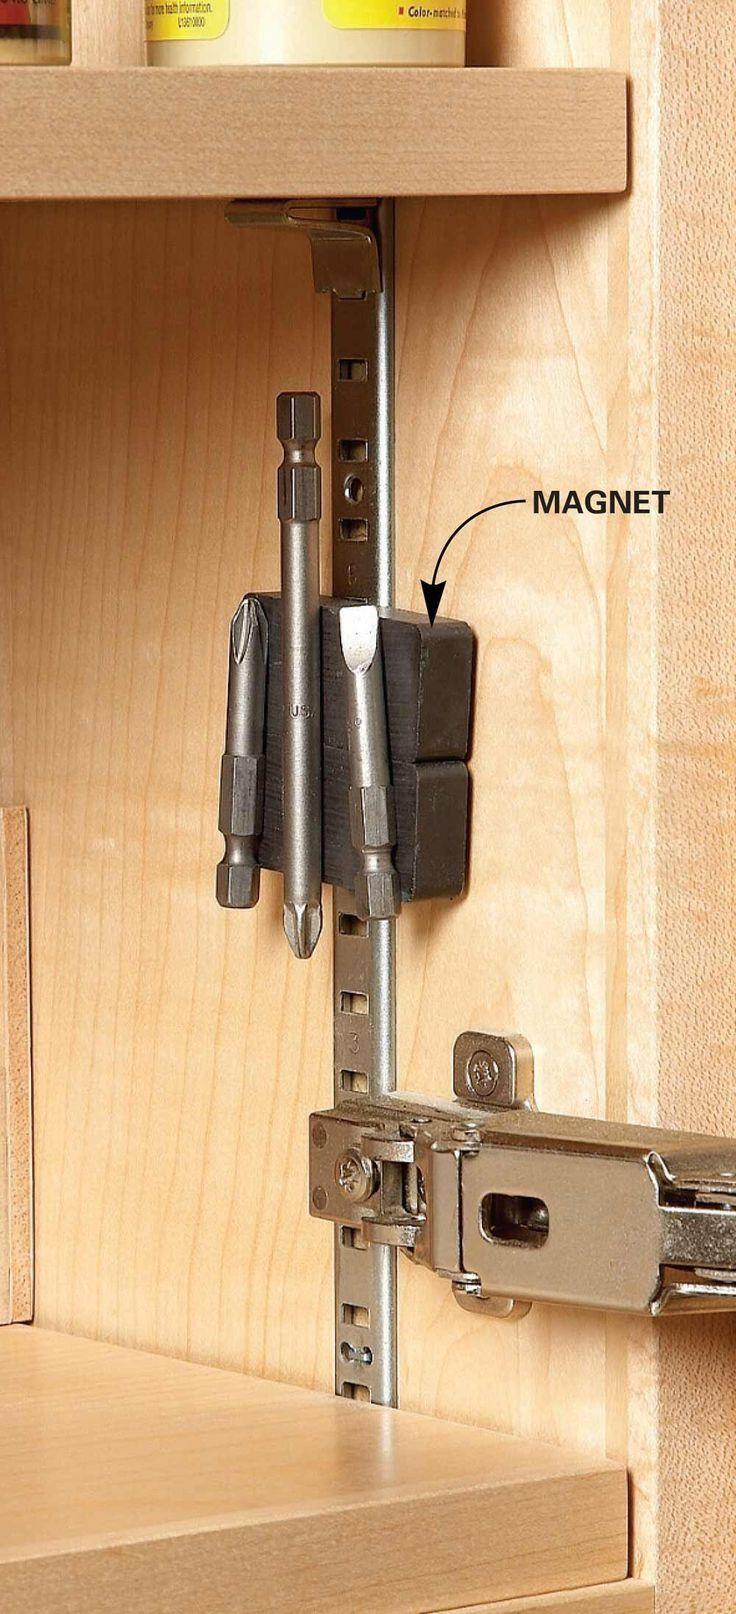 50 Cabinet Door Restraint Hardware Kitchen Decor Theme Ideas